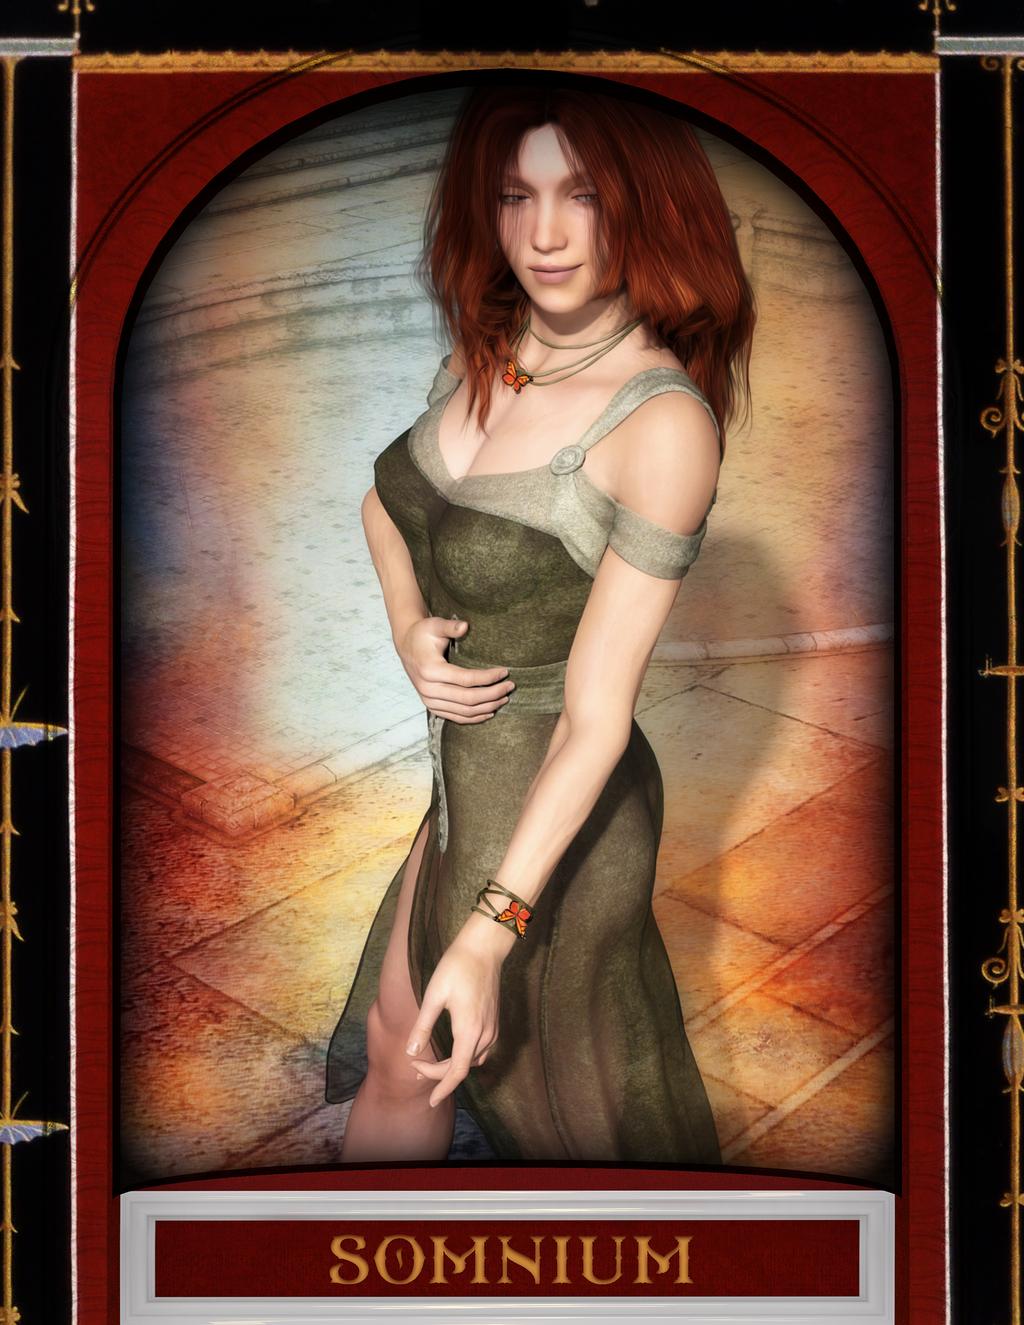 Chapter: Somnium by calasade